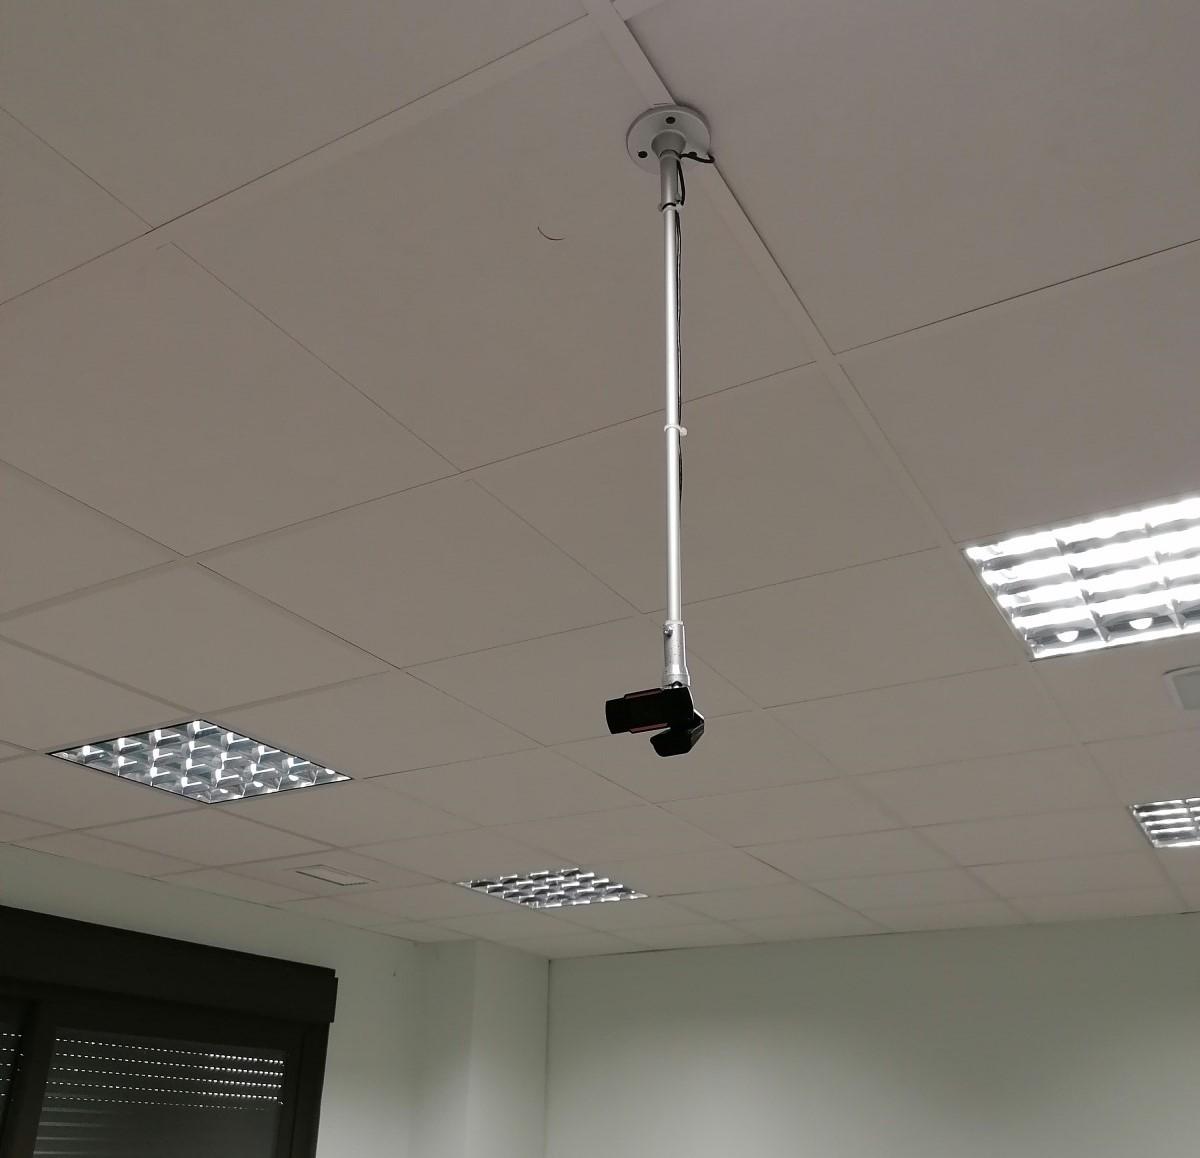 Instalación de varias cámaras a techo